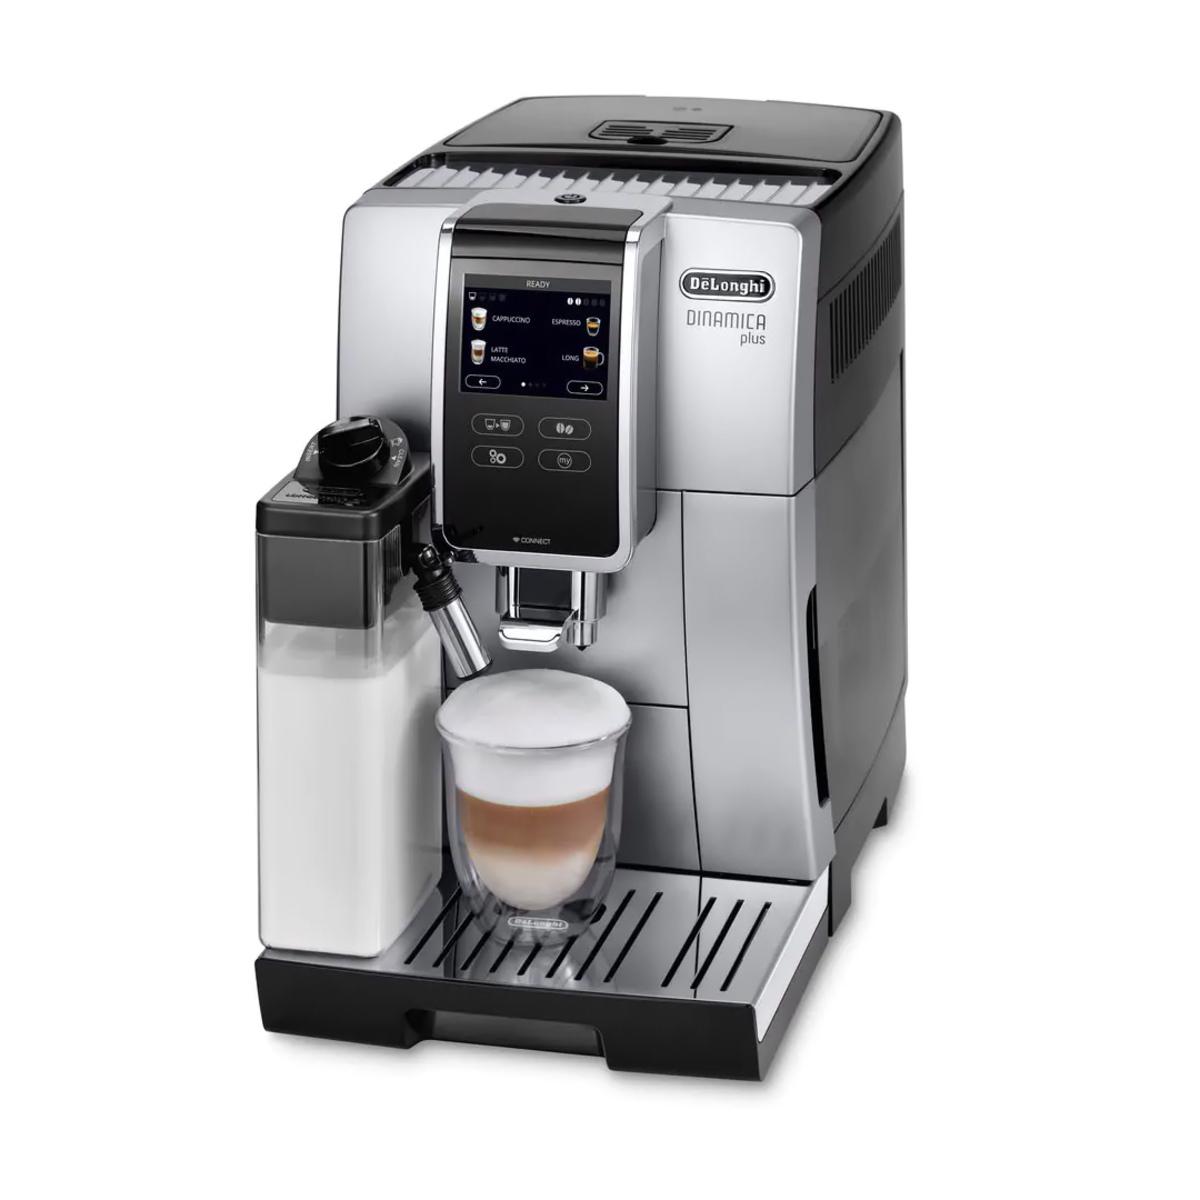 Delonghi ECAM37085SB Bean to Cup Coffee Machine, Silver